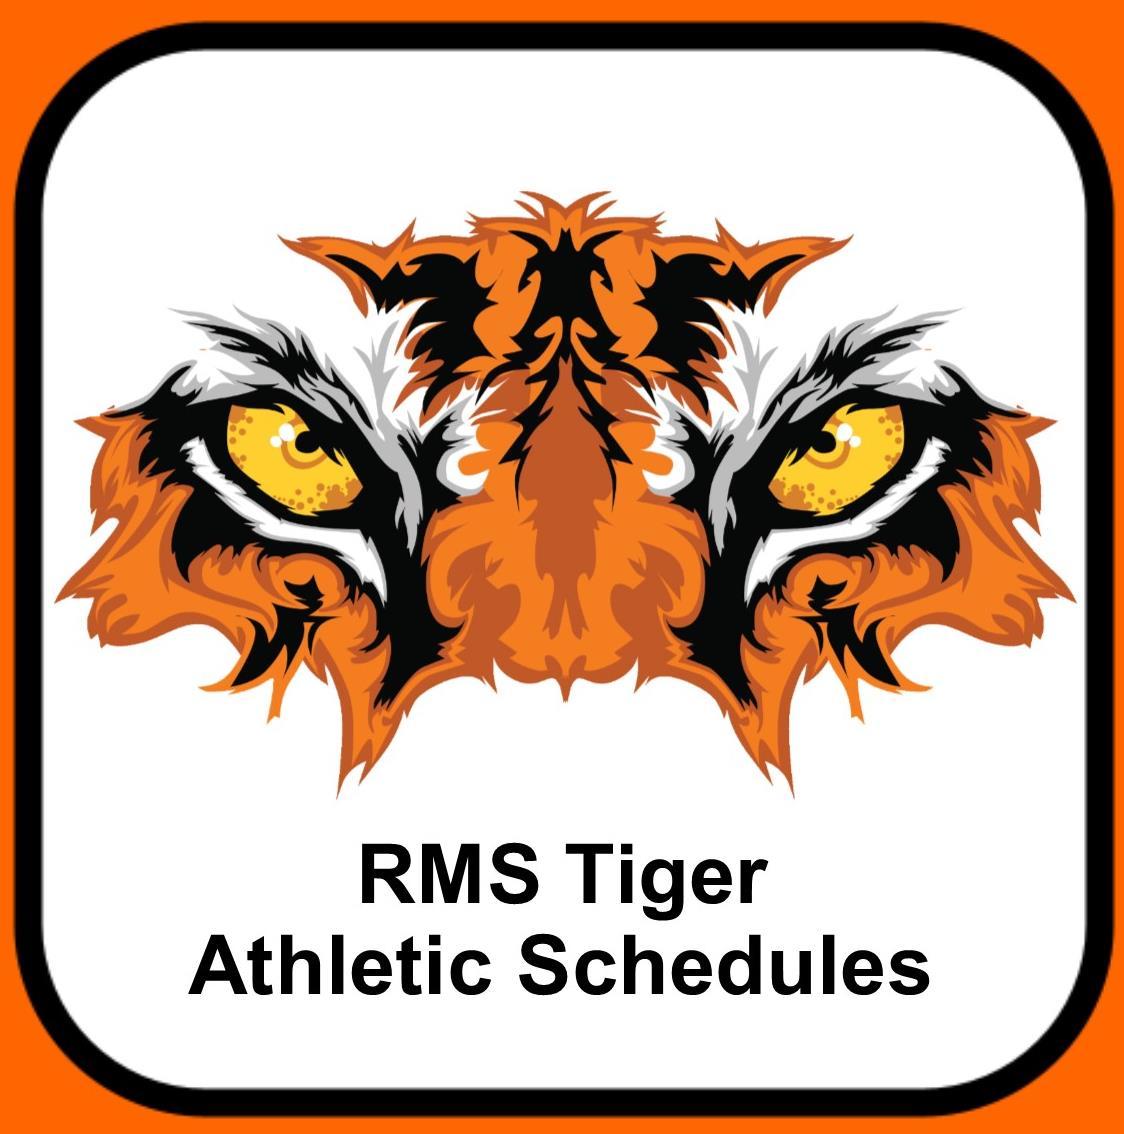 Athletic Schedules